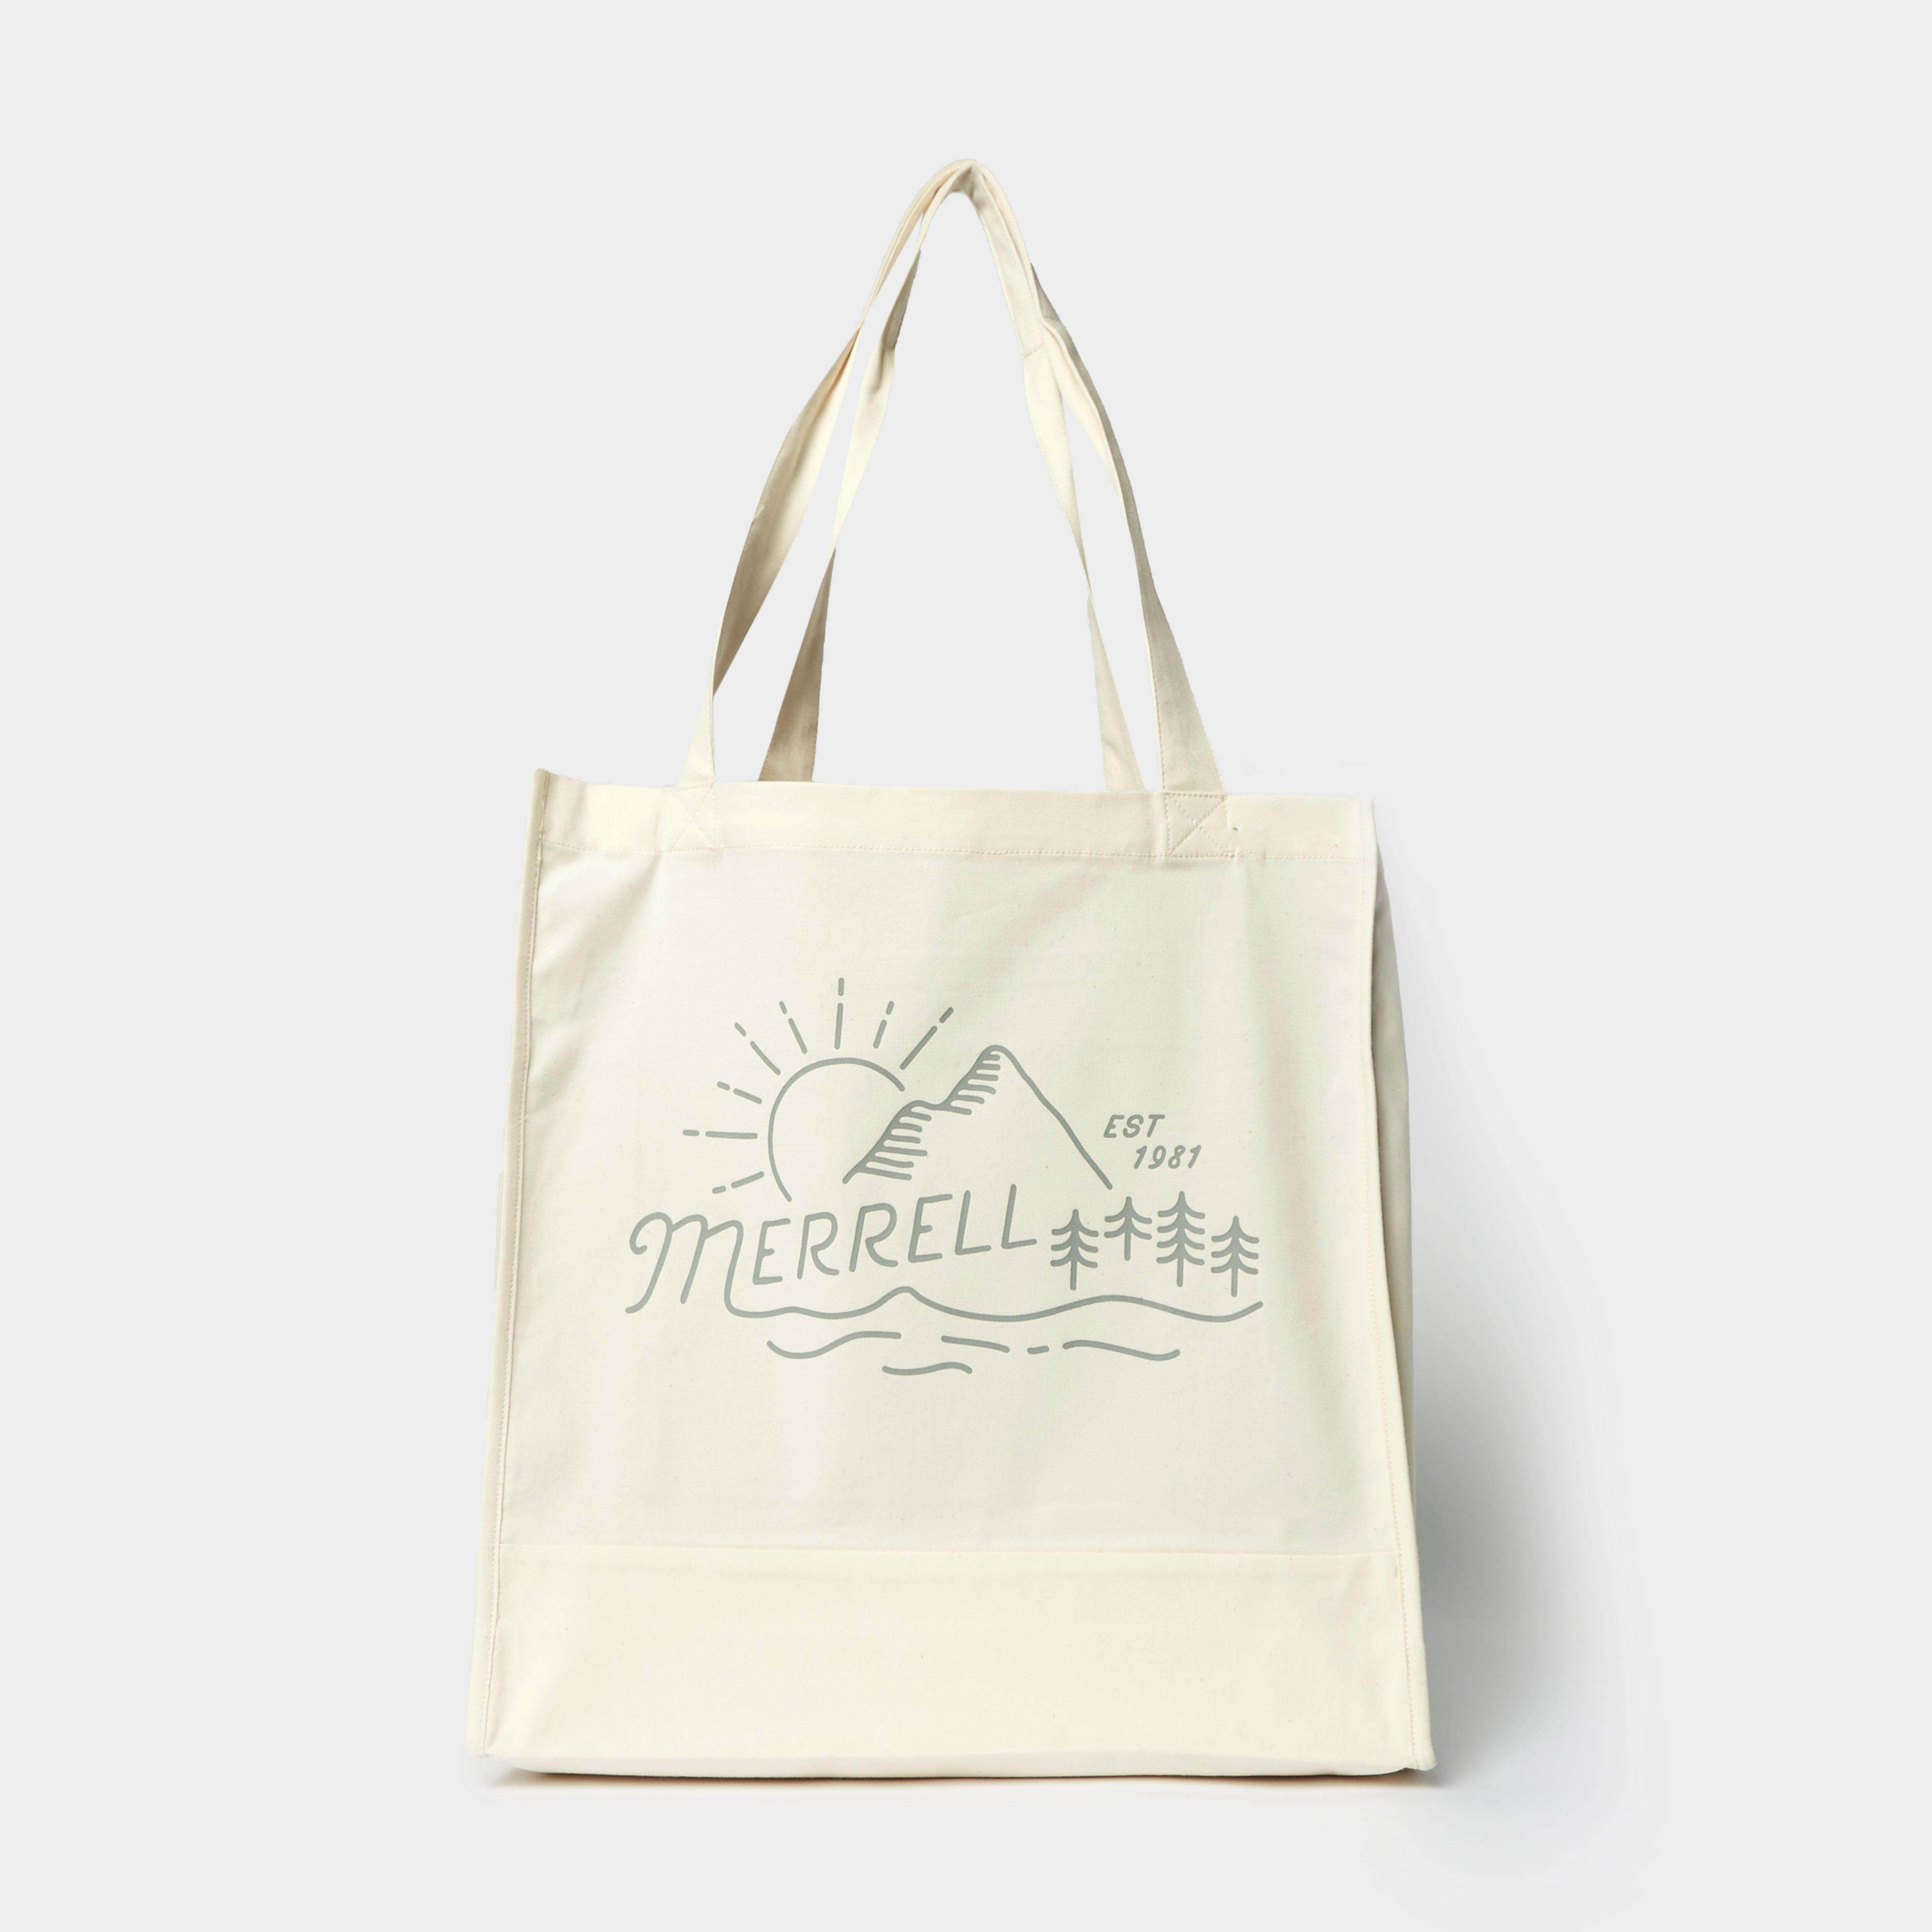 Merrell Trailhead Canvas Tote Bag - Beige/beige  Beige/beige